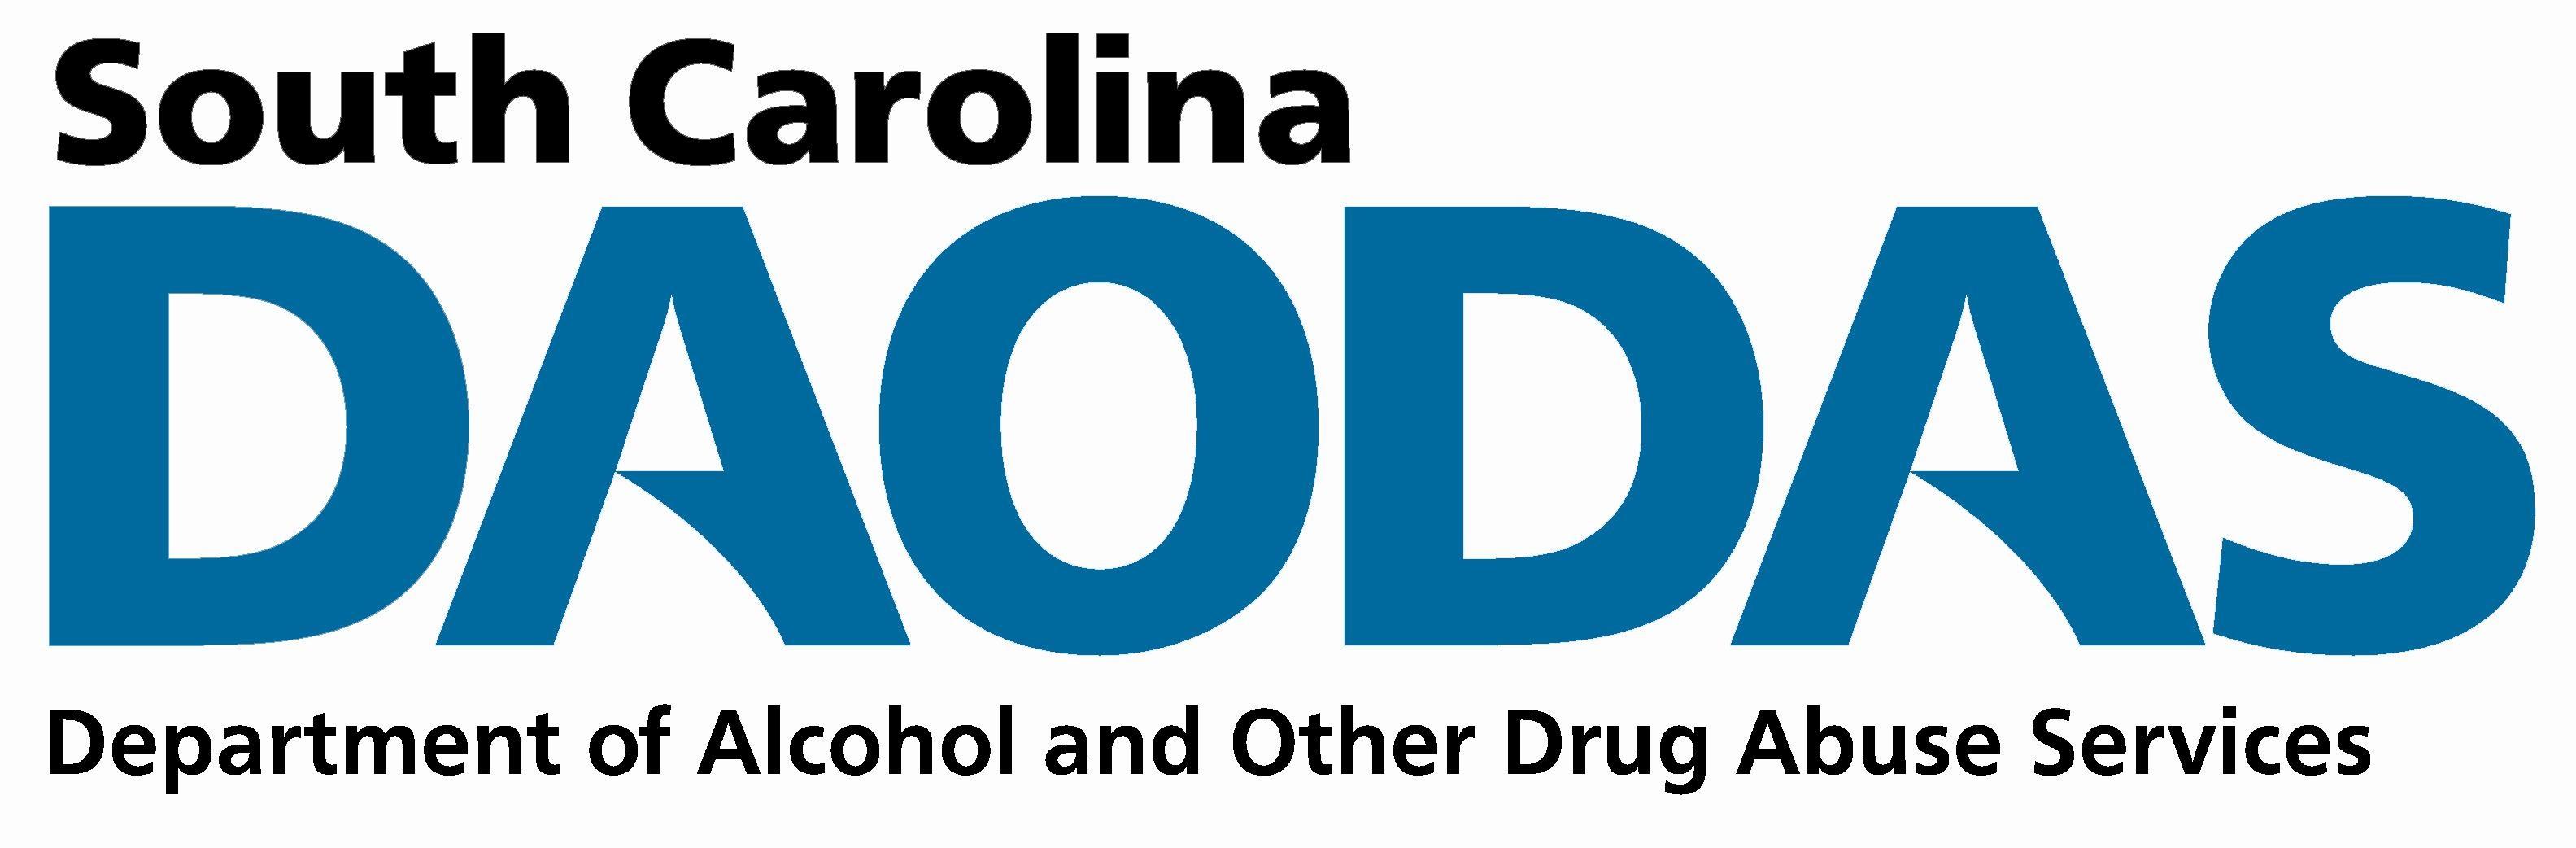 South Carolina Logo